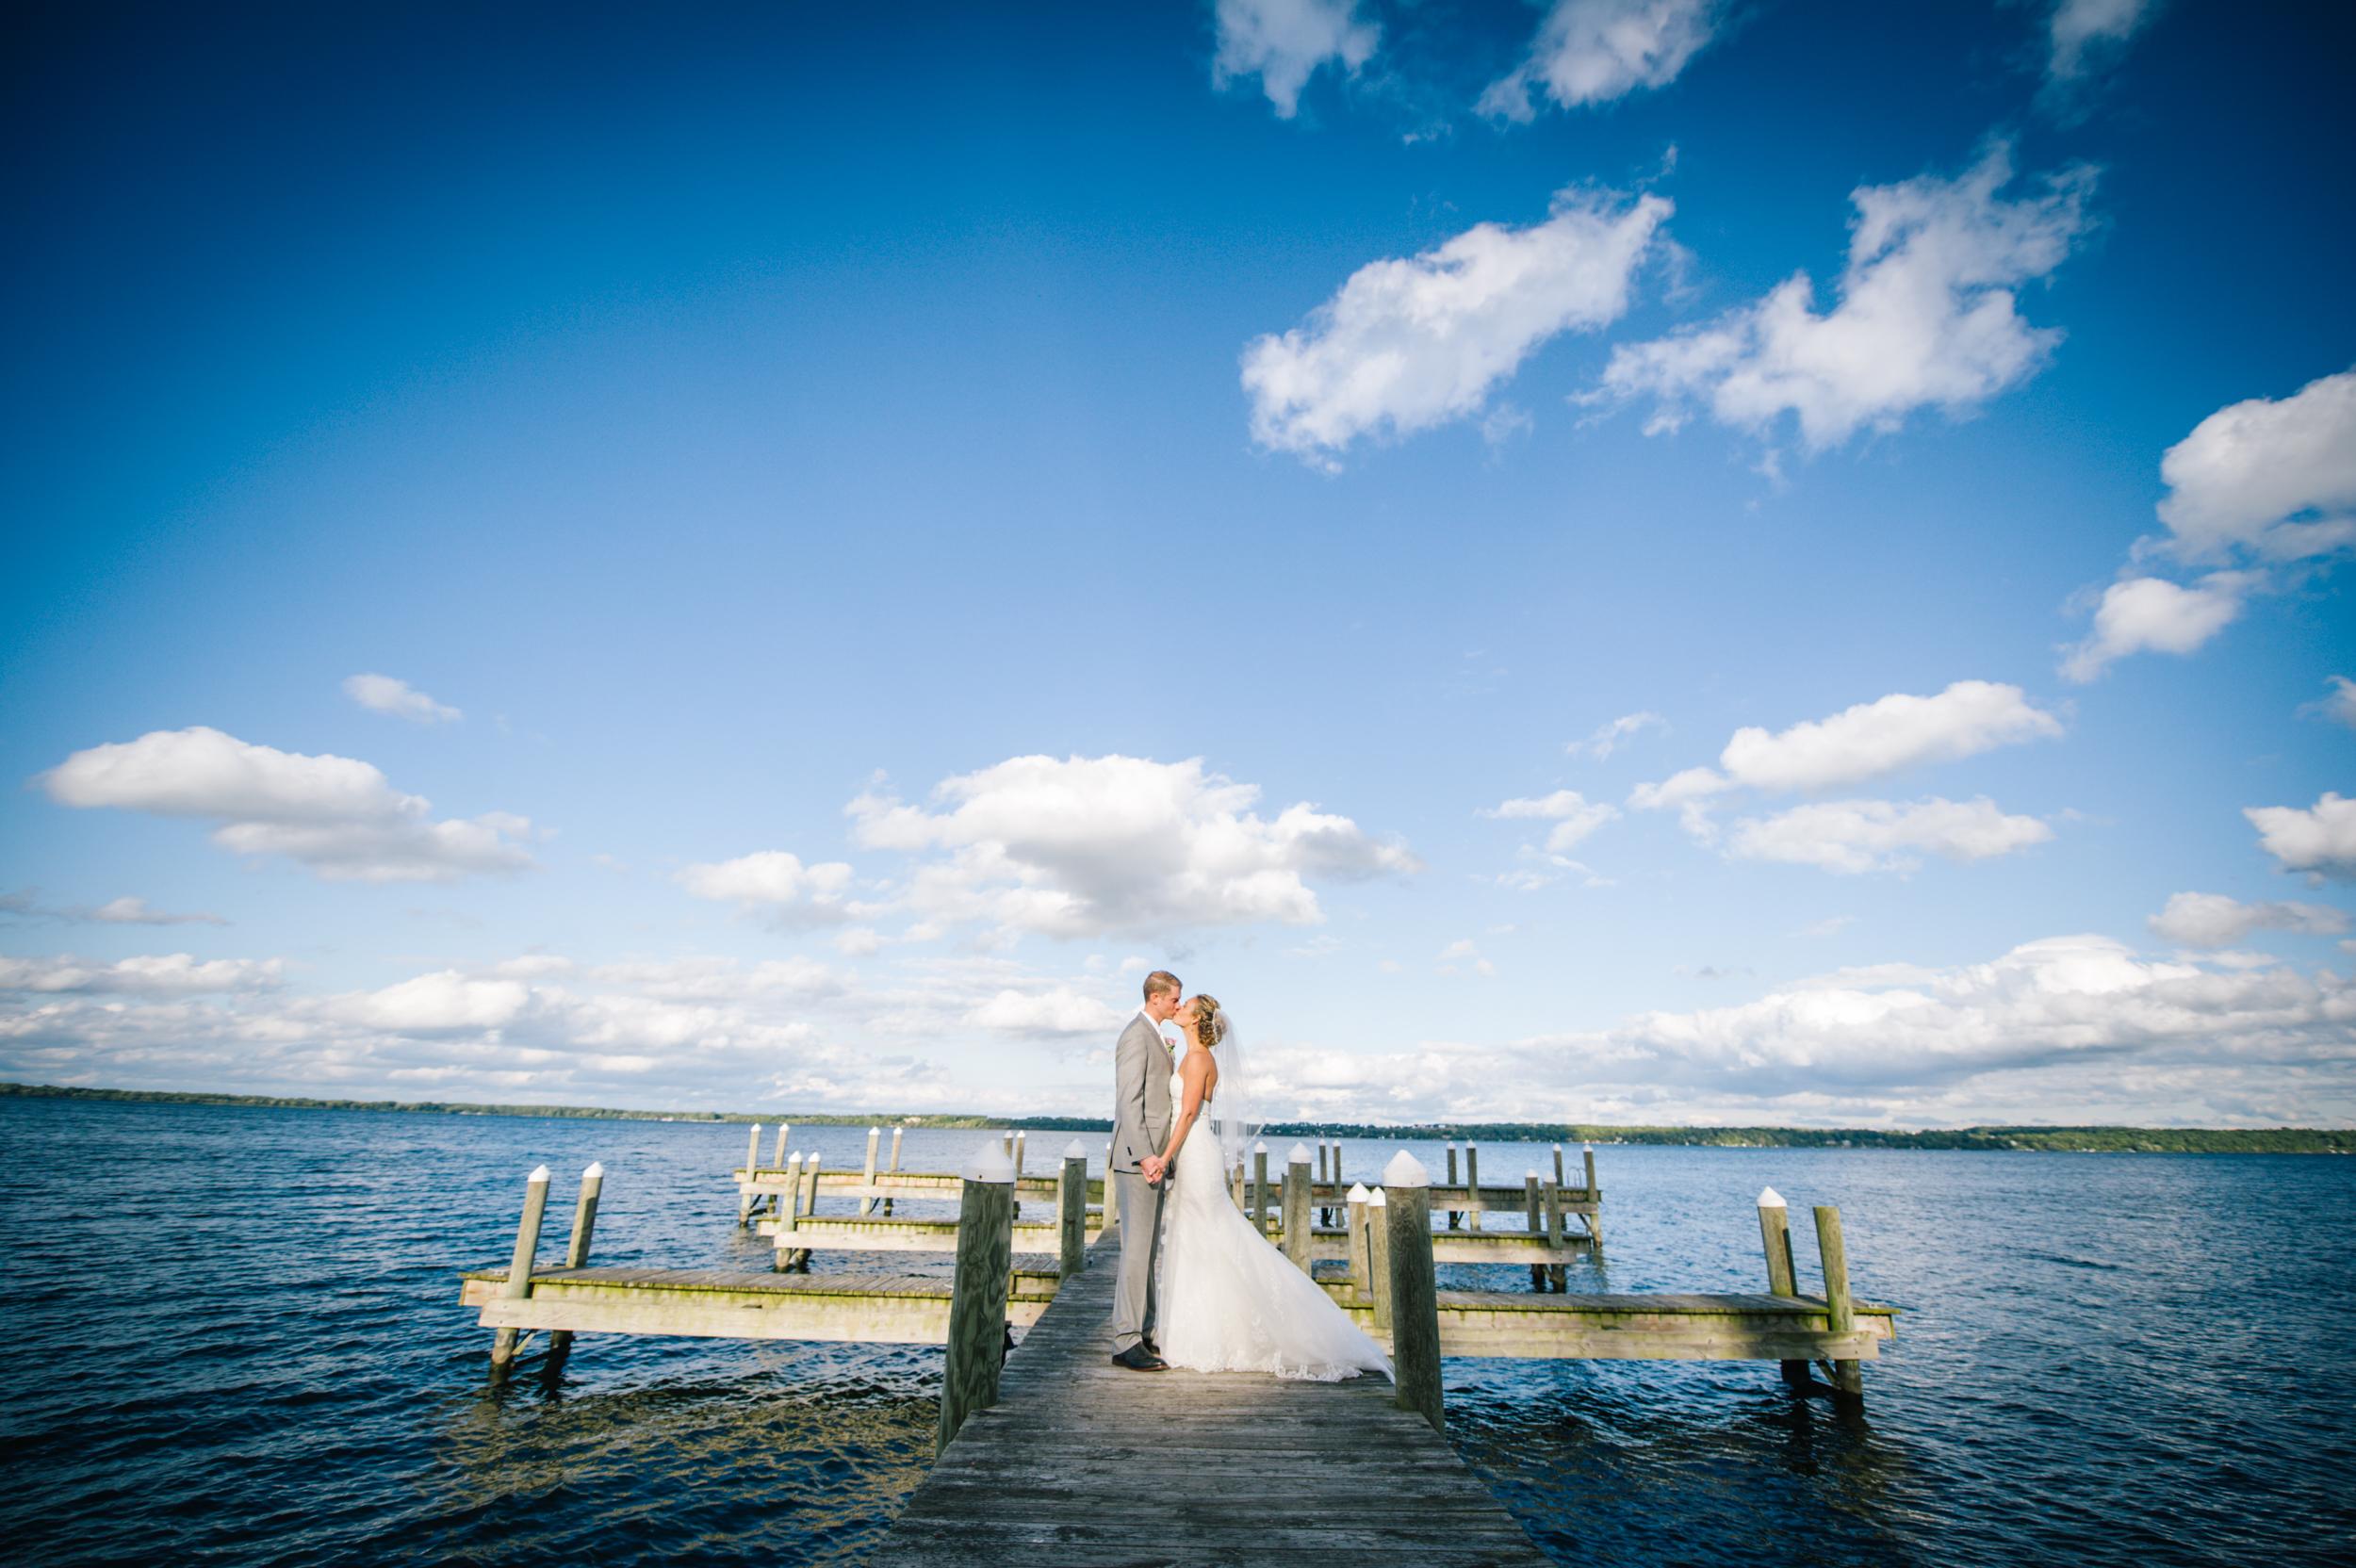 JKP-Destination-Weddings-0019.JPG